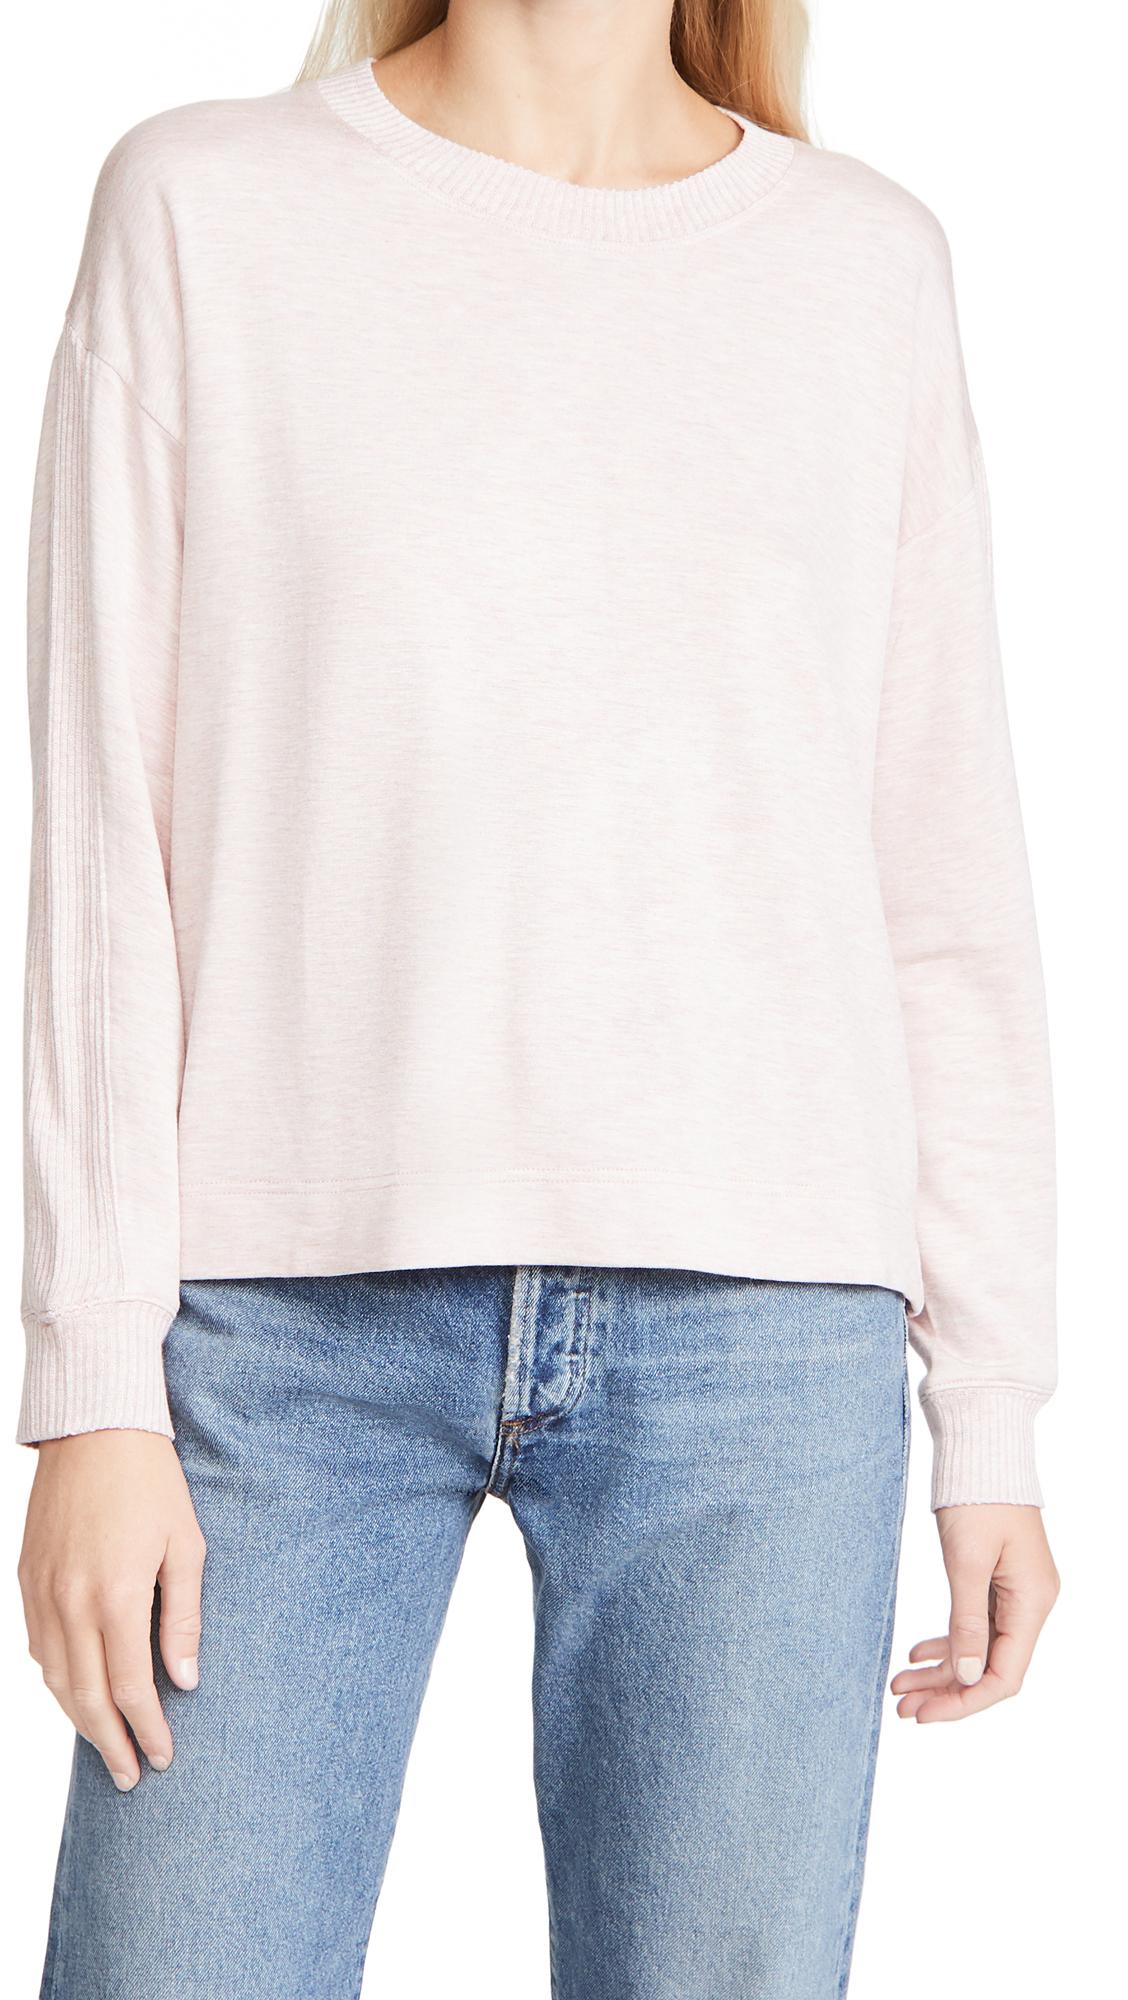 Splendid Acid Wash Supersoft Sweater